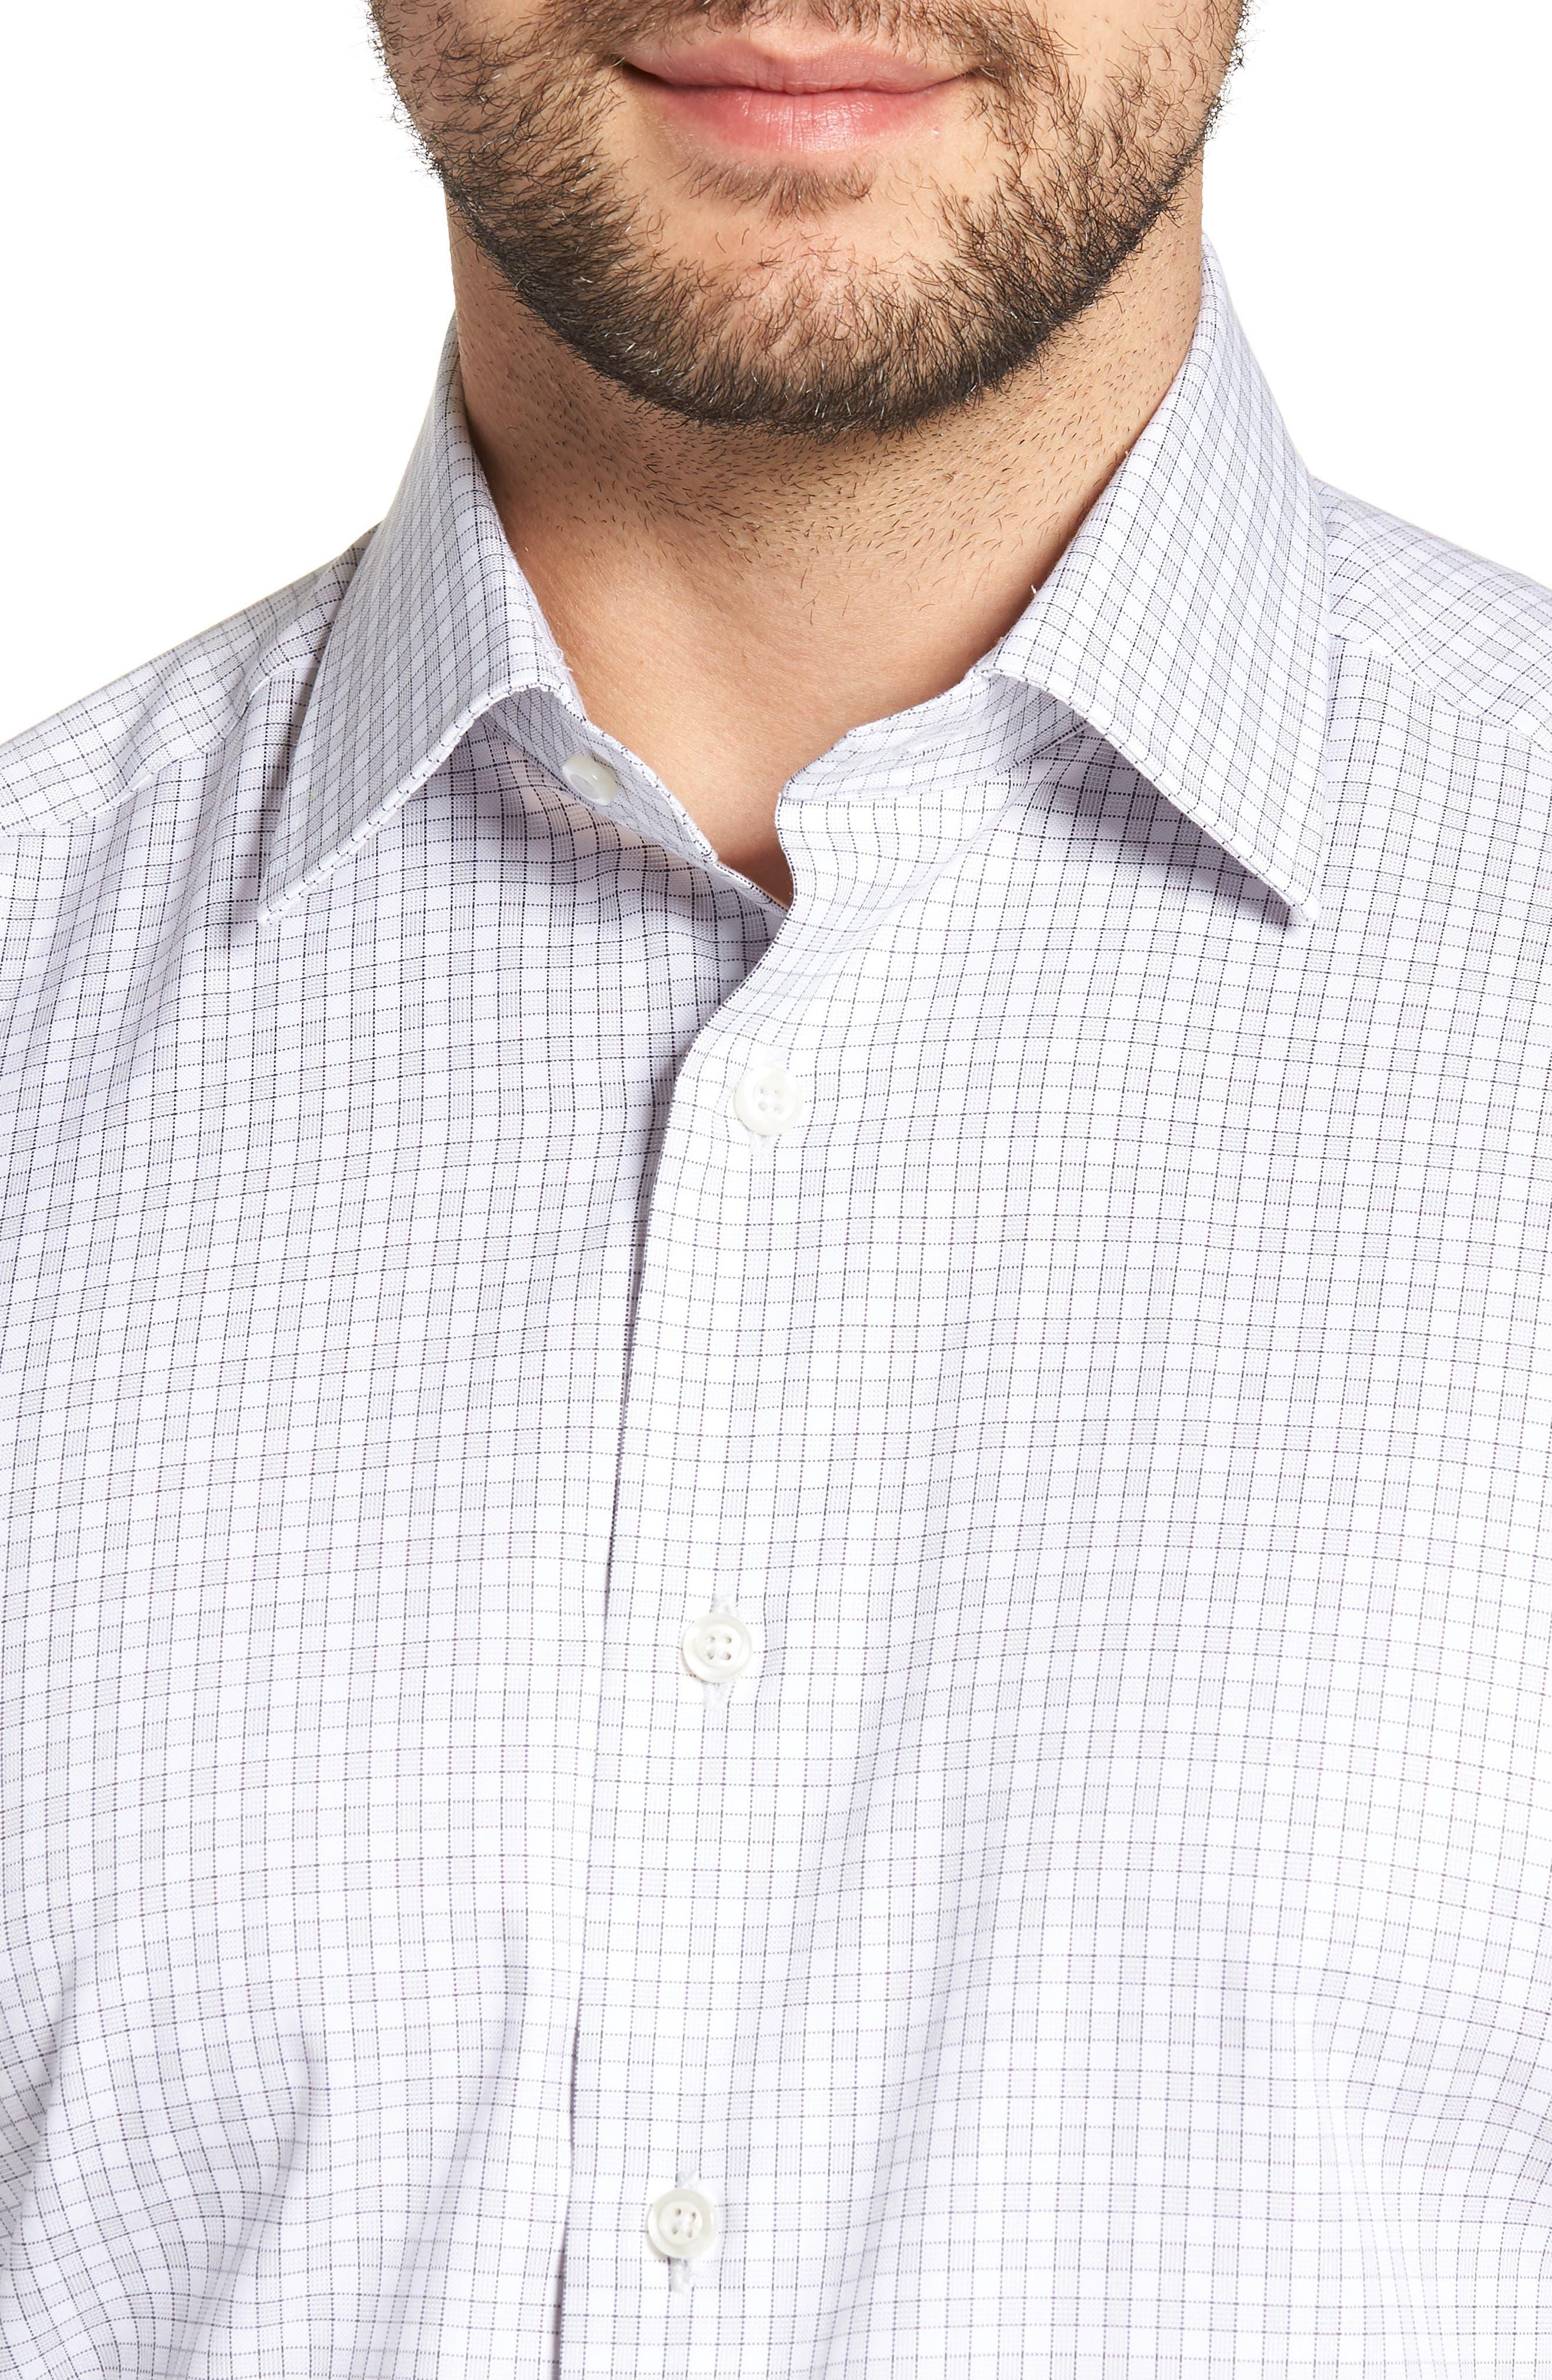 Regular Fit Check Dress Shirt,                             Alternate thumbnail 2, color,                             Gray